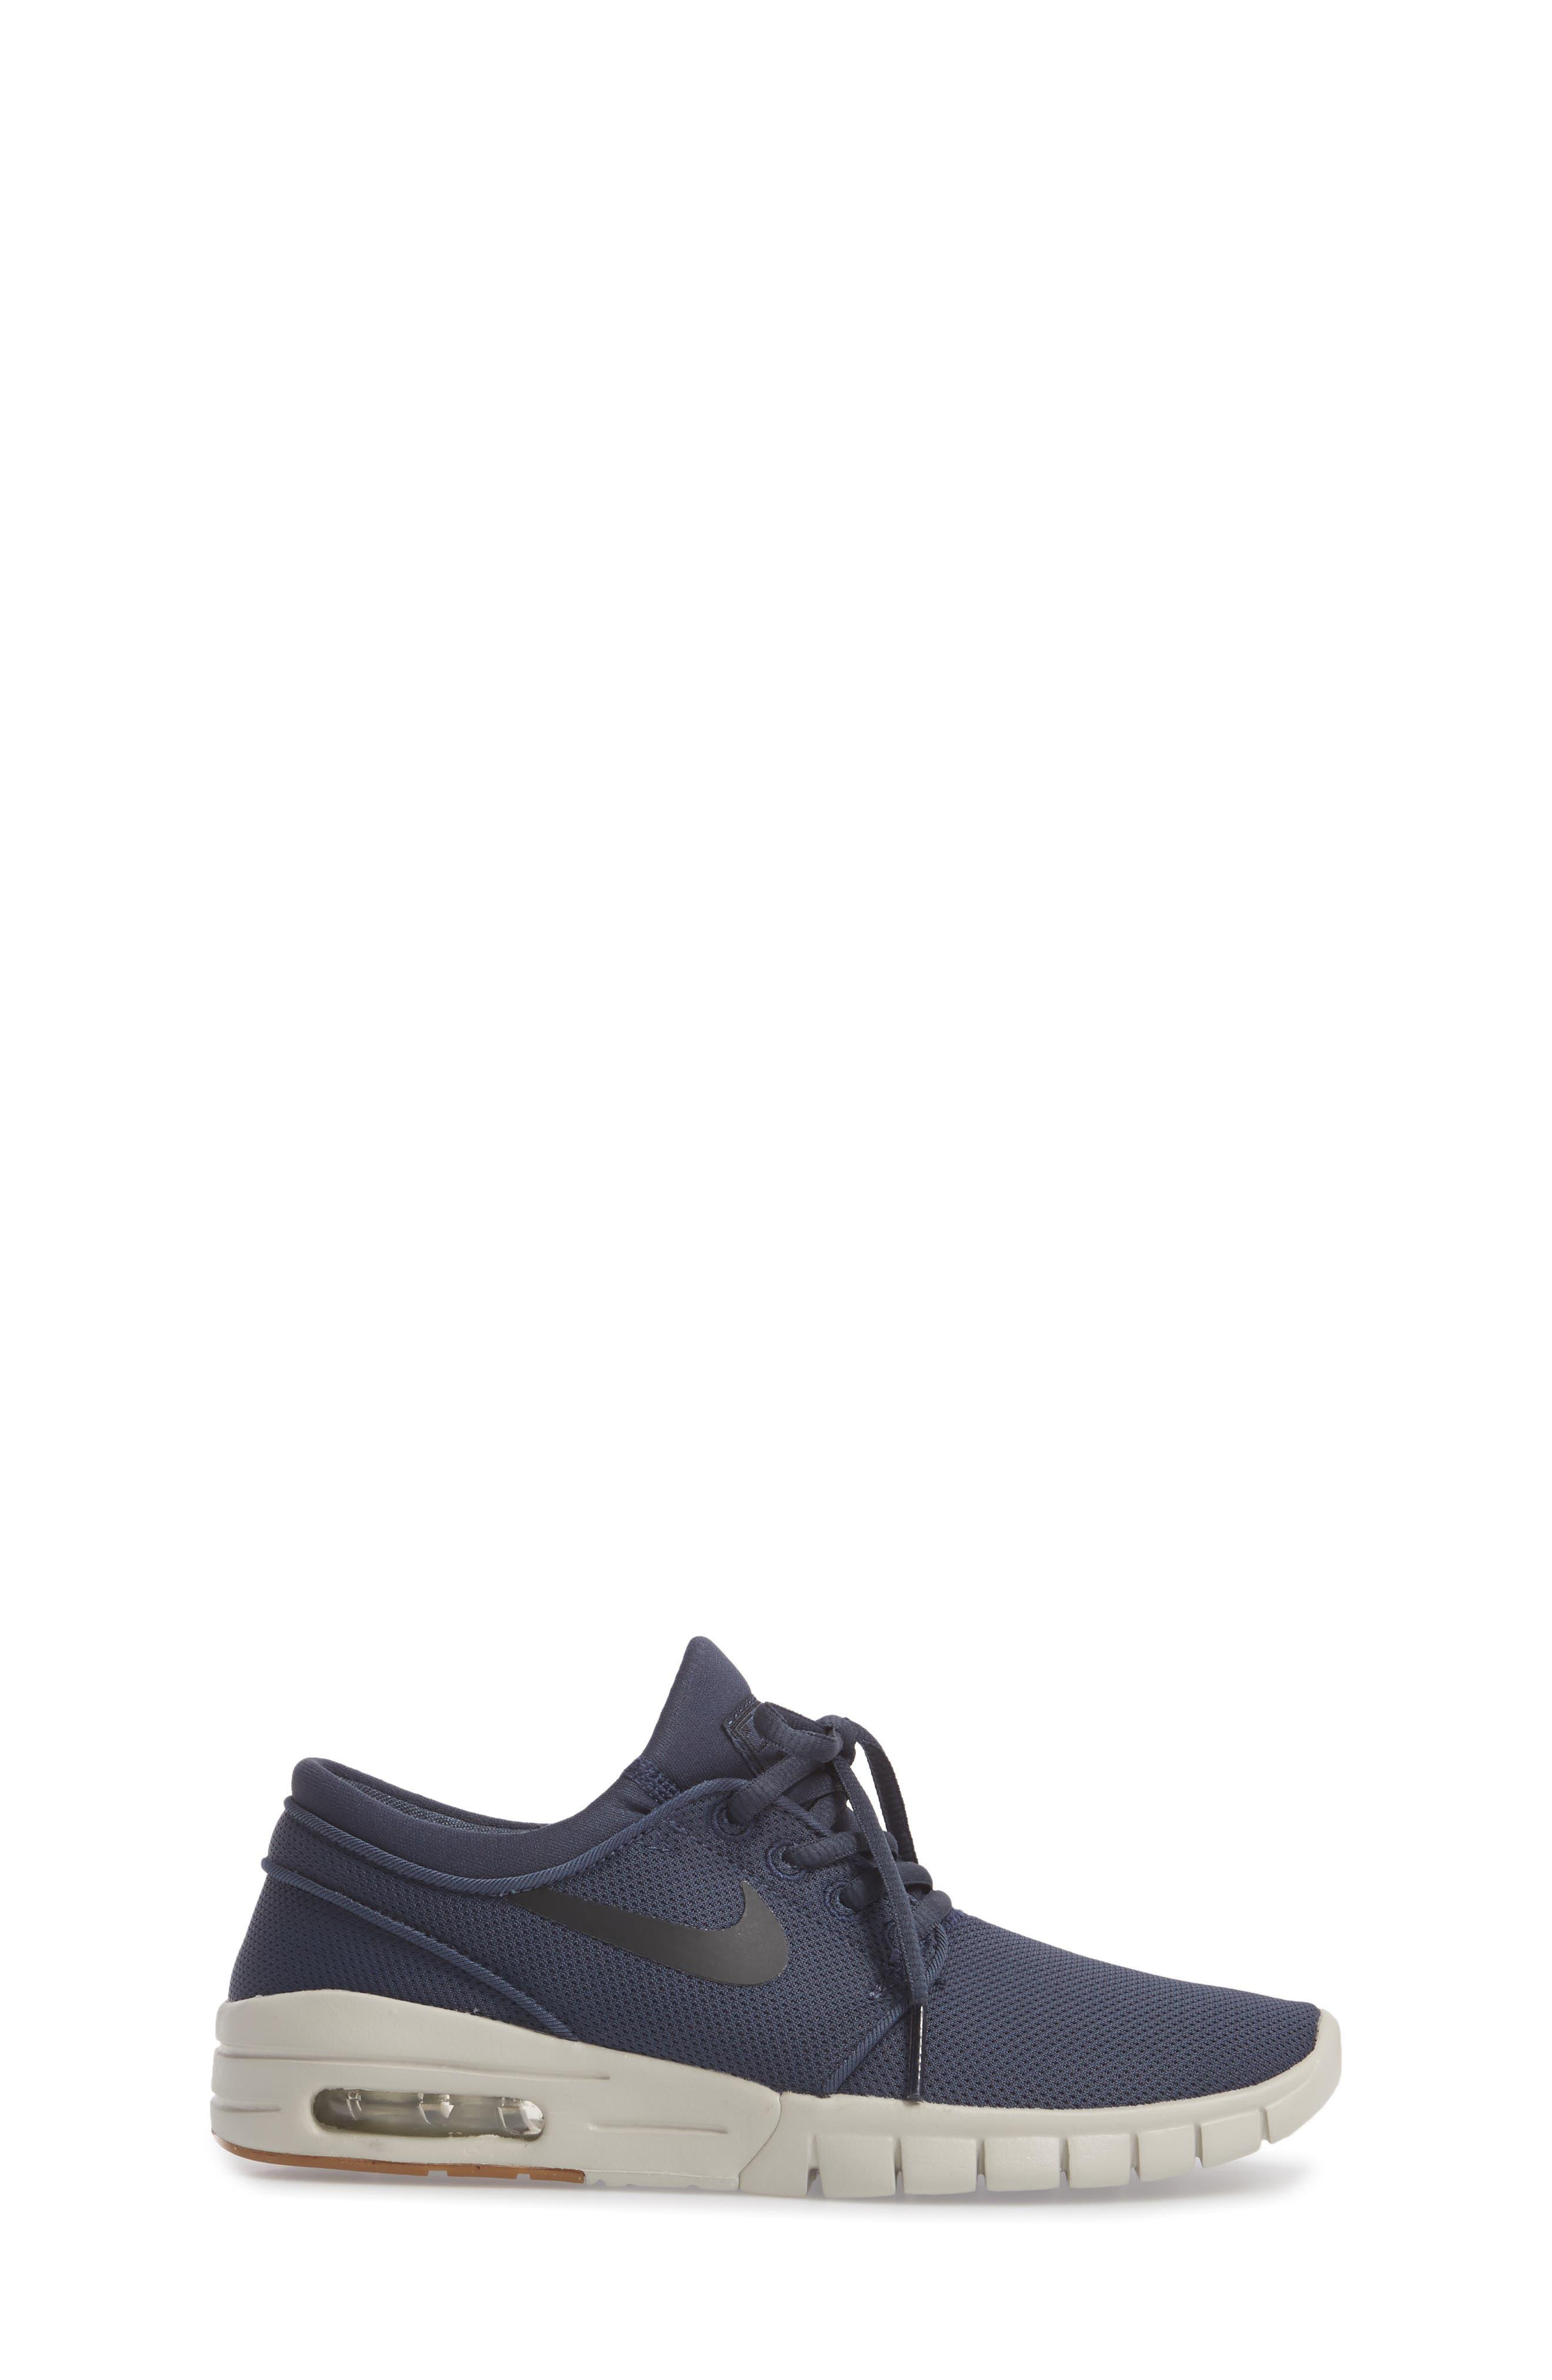 Stefan Janoski Max SB Skate Sneaker,                             Alternate thumbnail 21, color,